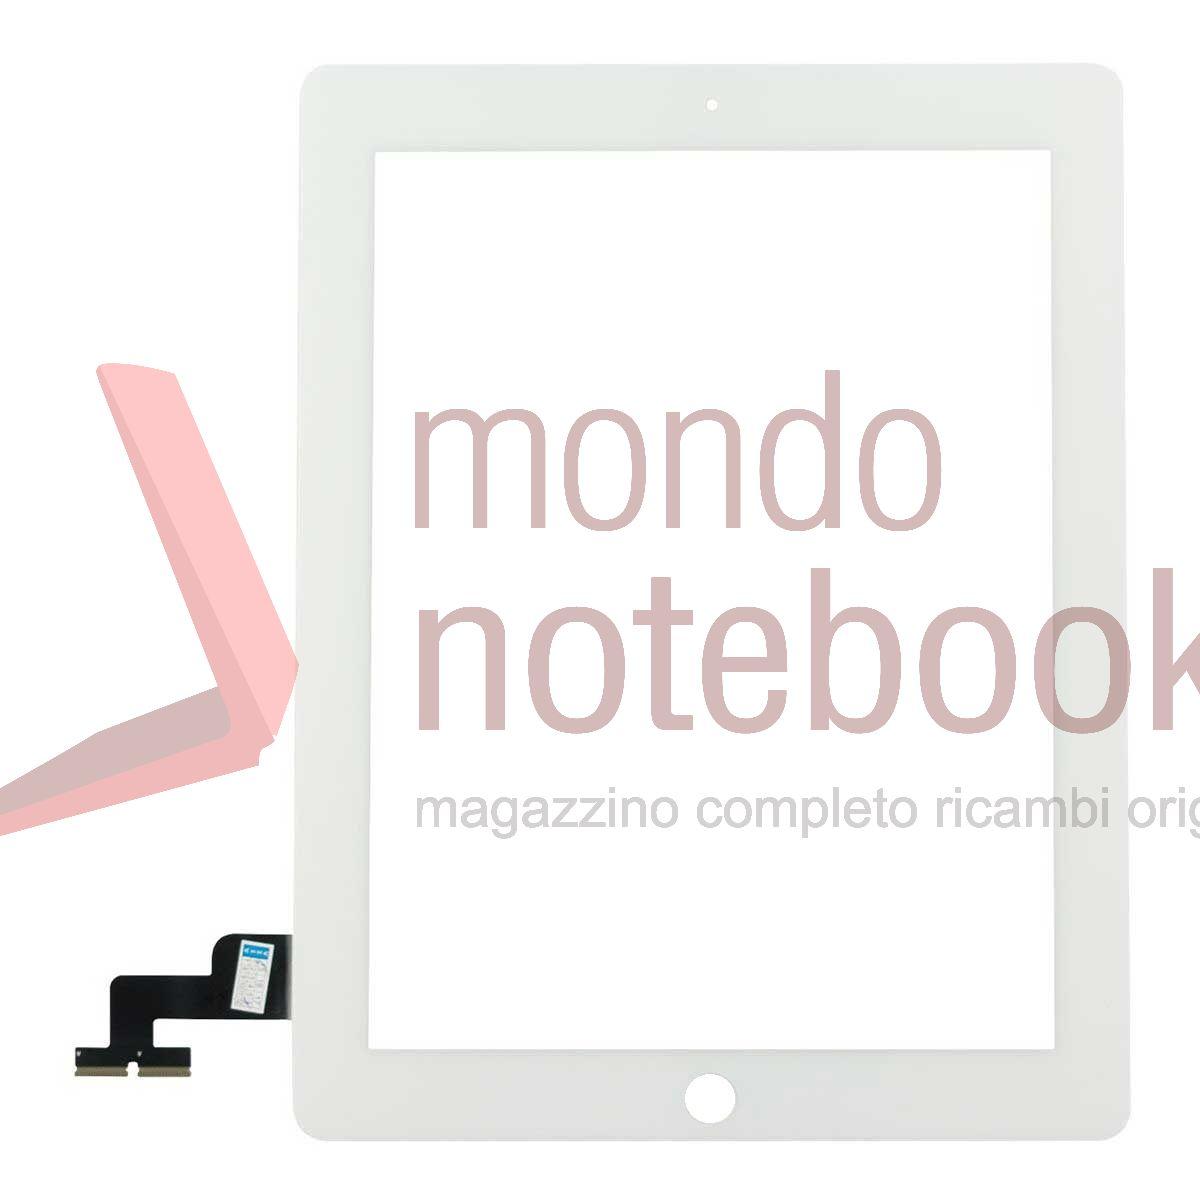 https://www.mondonotebook.it/3212/vetro-touch-screen-apple-ipad-2-bianco-white-touchscreen.jpg